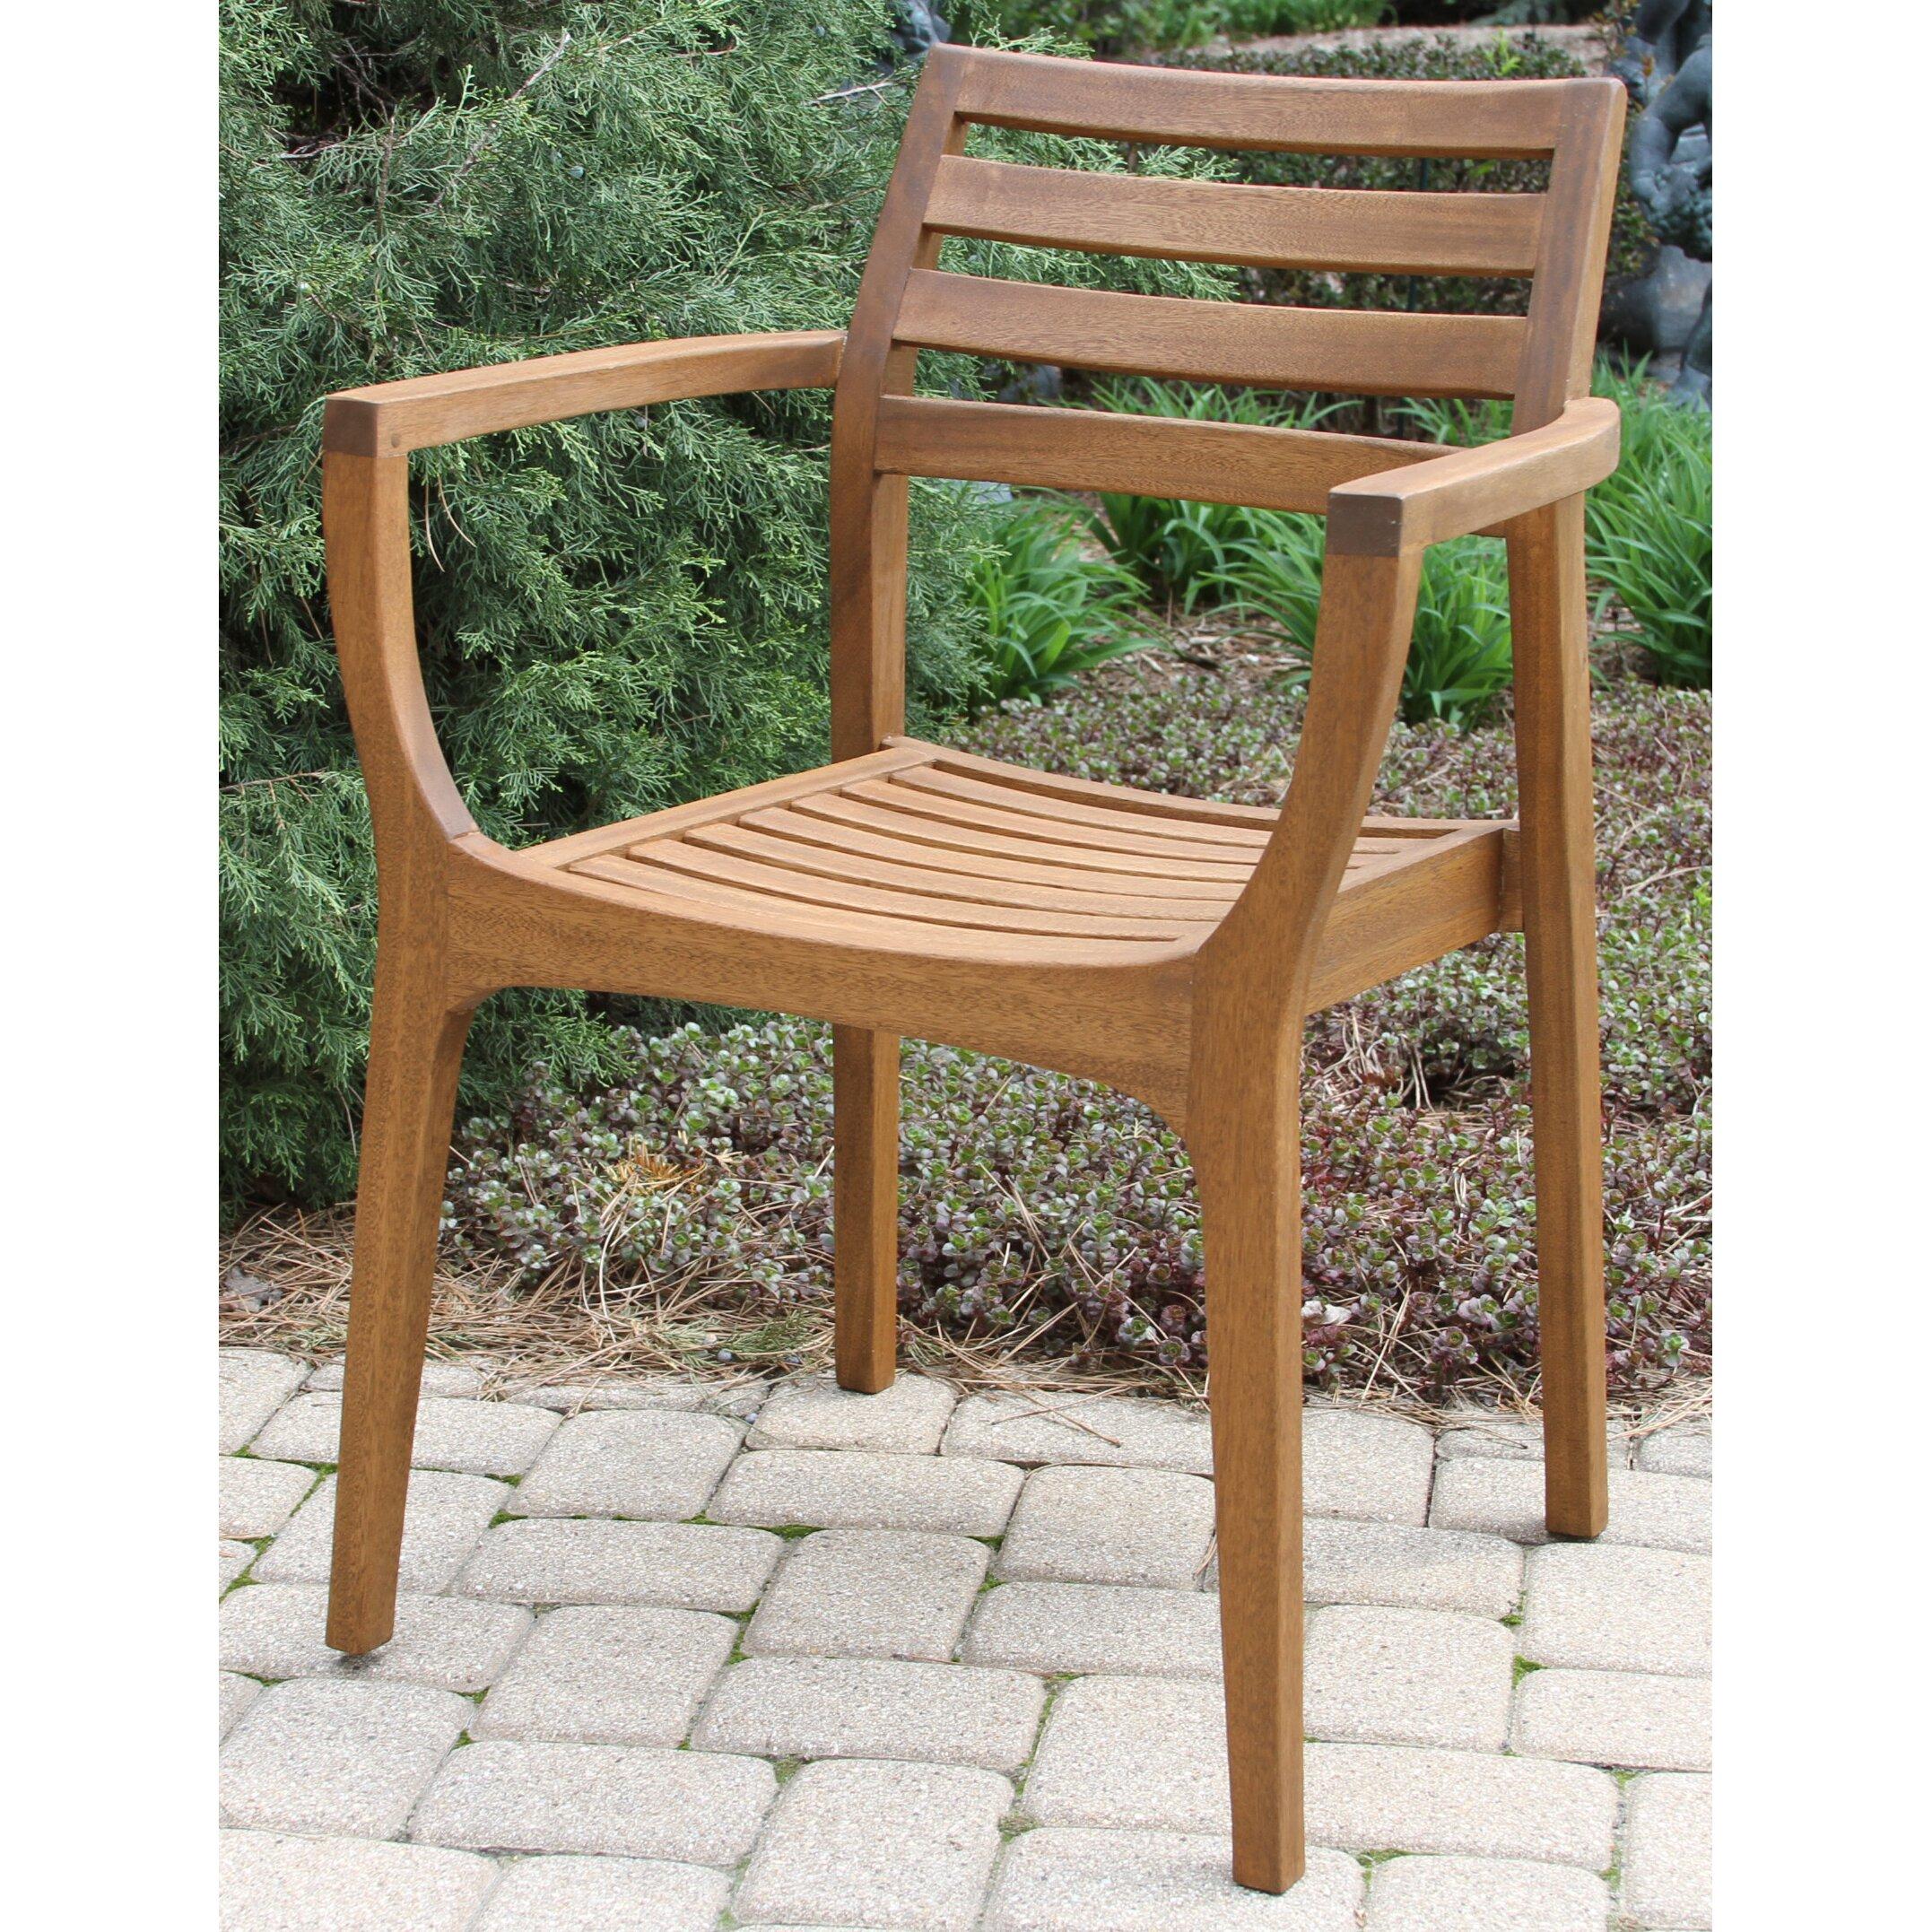 Outdoor interiors danish eucalyptus stacking chair reviews wayfair for Outdoor interiors eucalyptus rocking chair